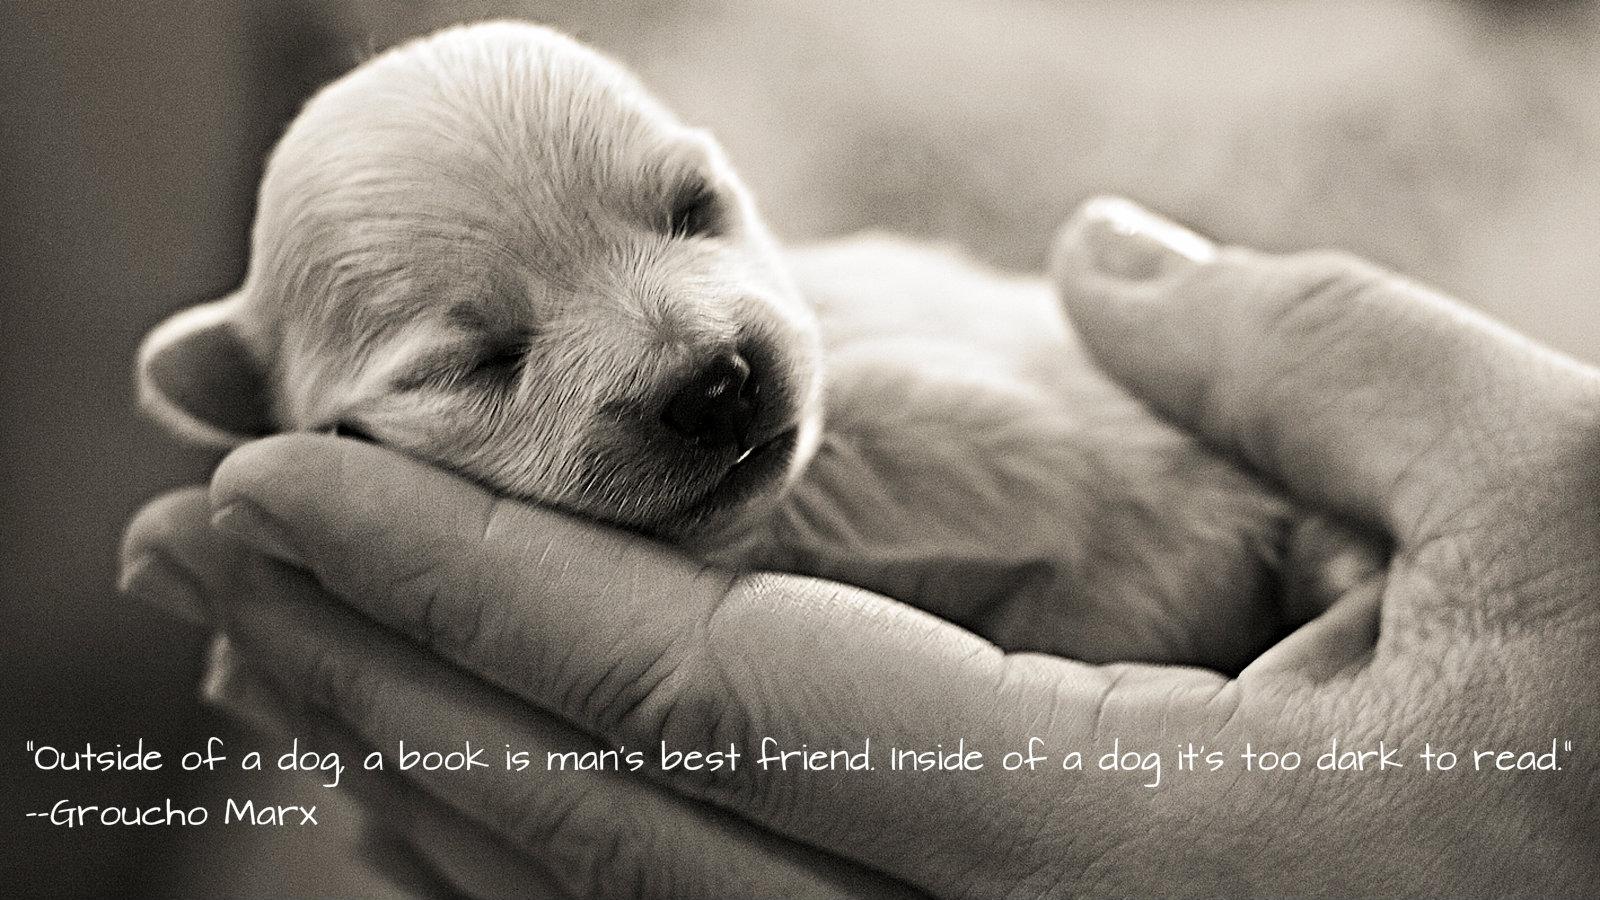 When A Dog Dies Quotes Quotesgram: New Puppy Quotes. QuotesGram